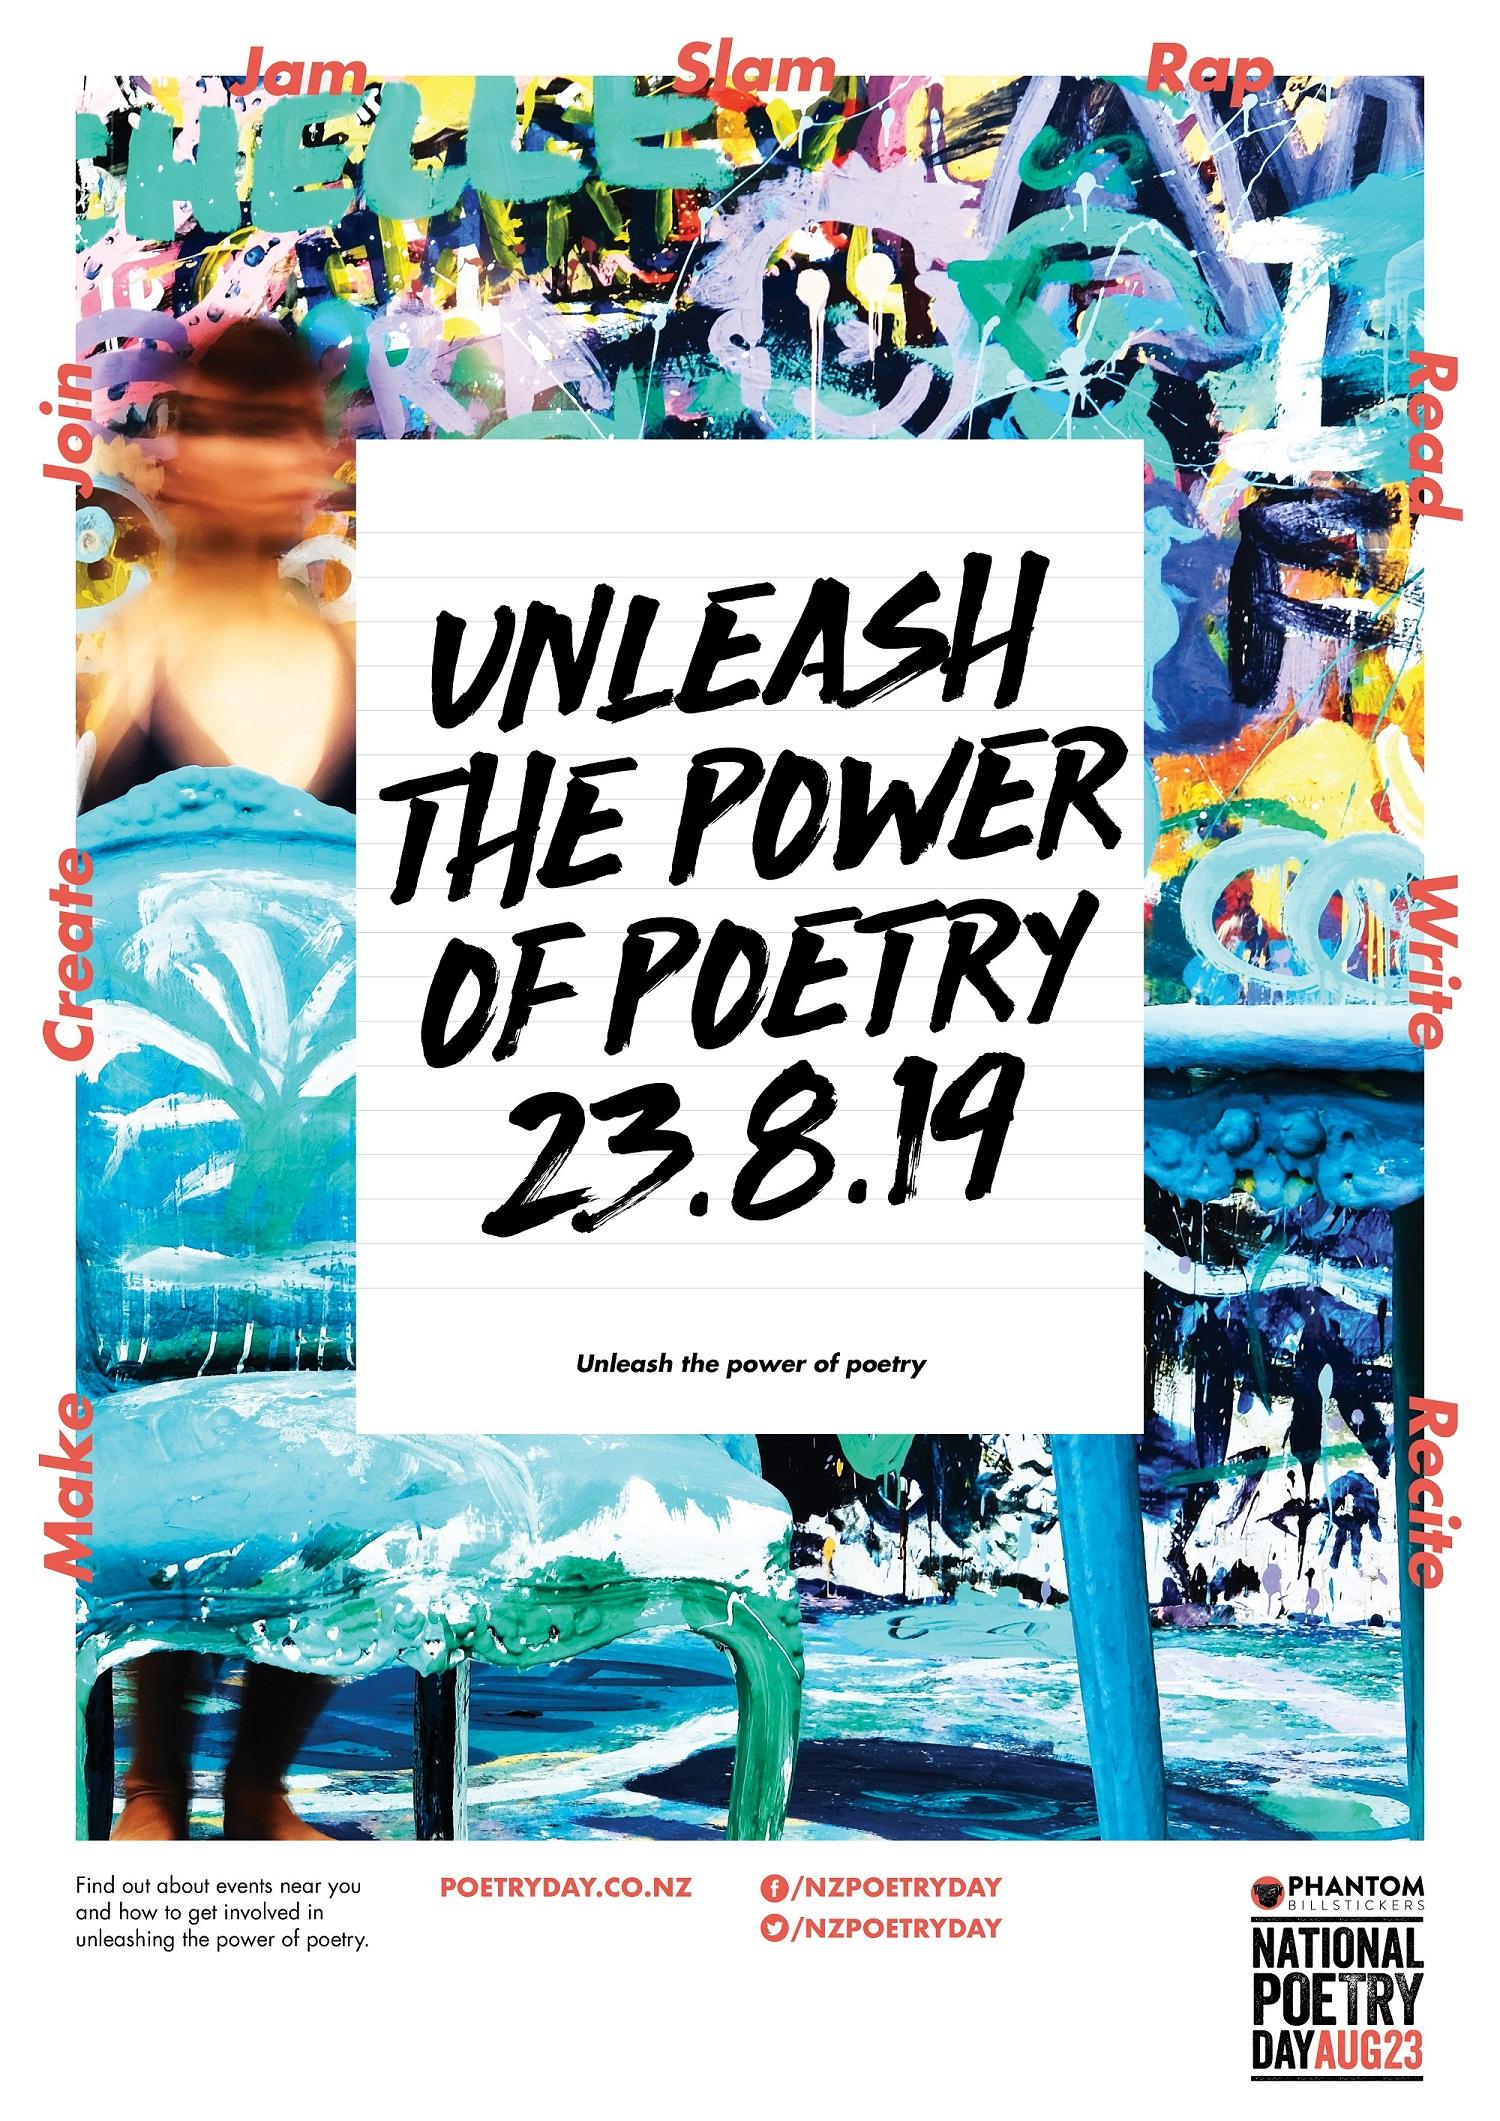 Phantom Billstickers National Poetry Day 2019 Poster.jpg